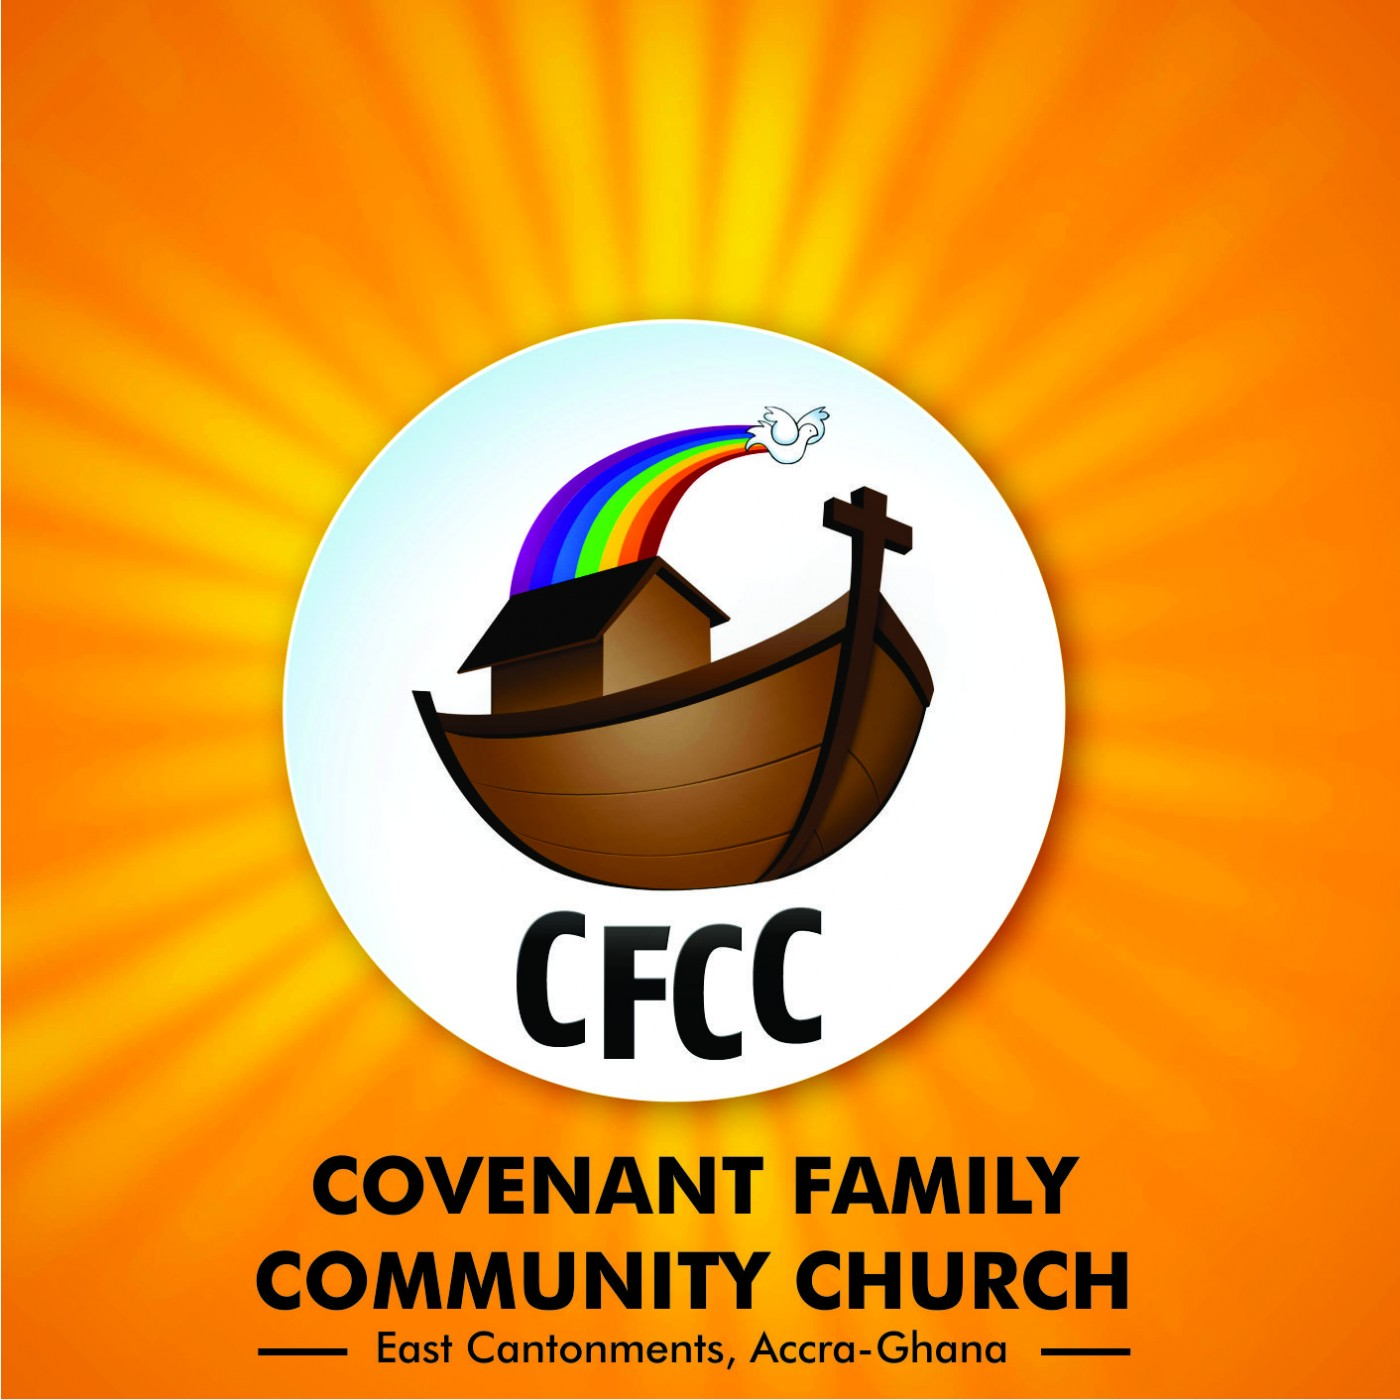 COVENANT FAMILY COMMUNITY CHURCH